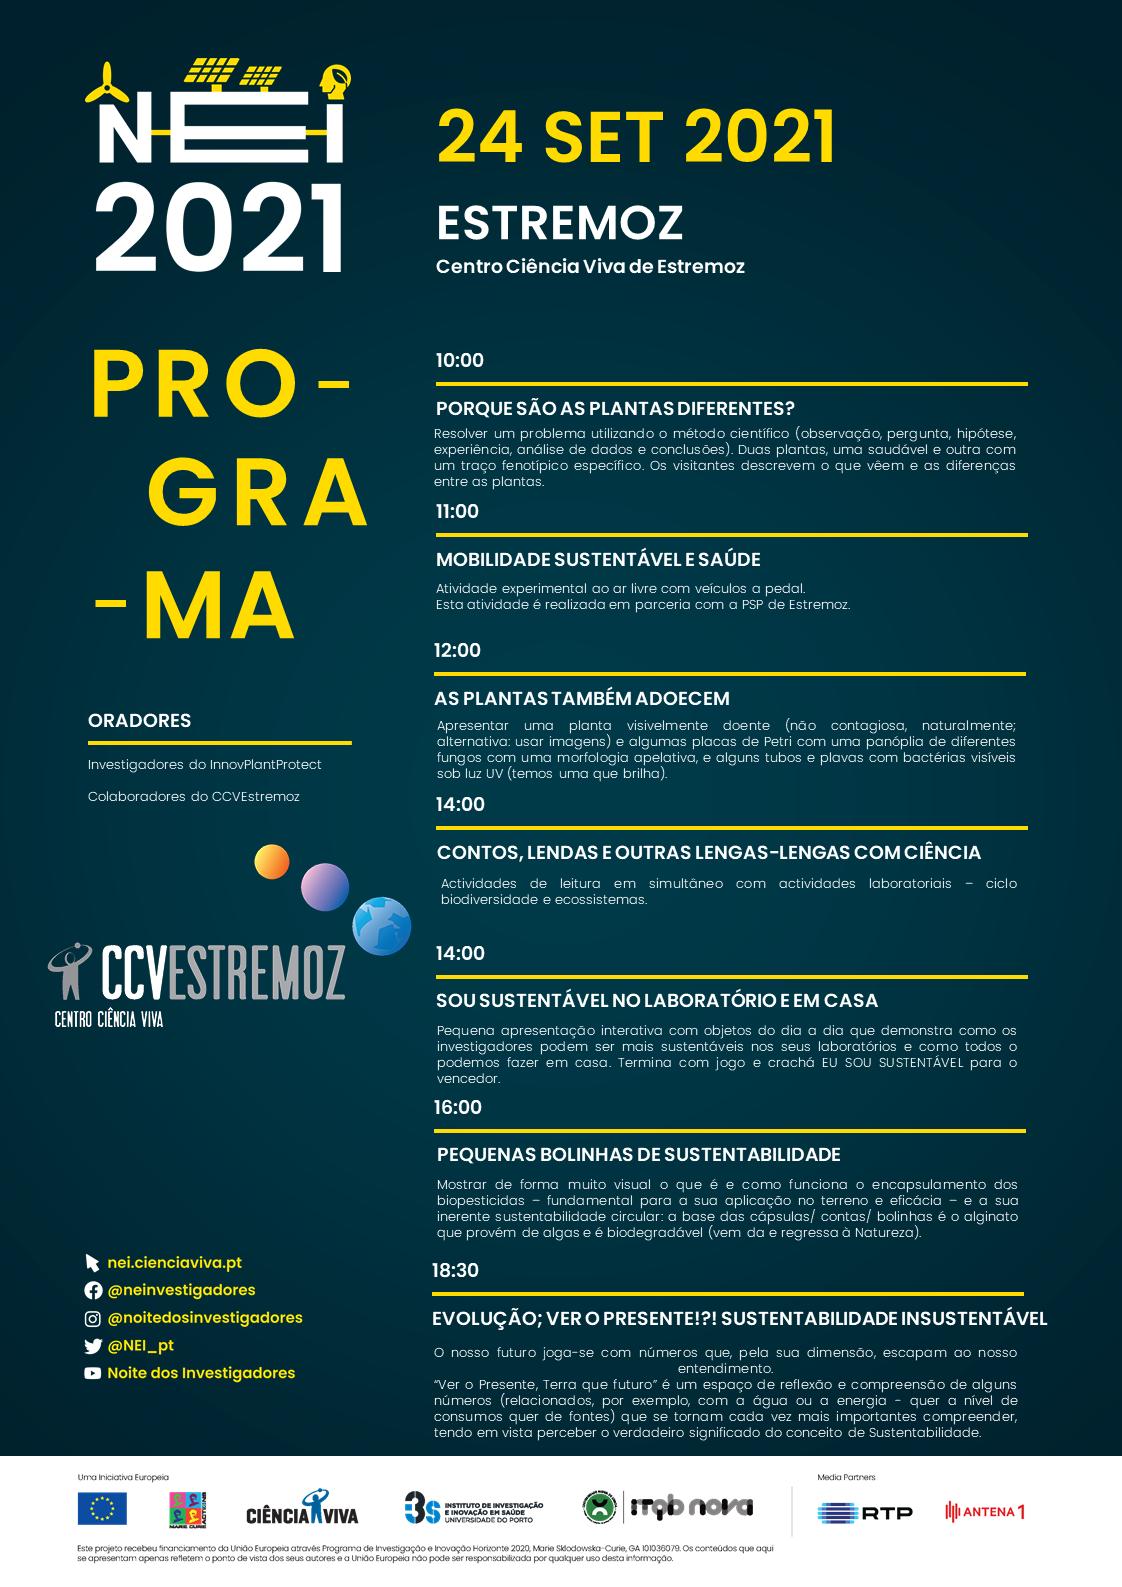 2107_NEI2021_PROGRAMA_CCVEstremoz